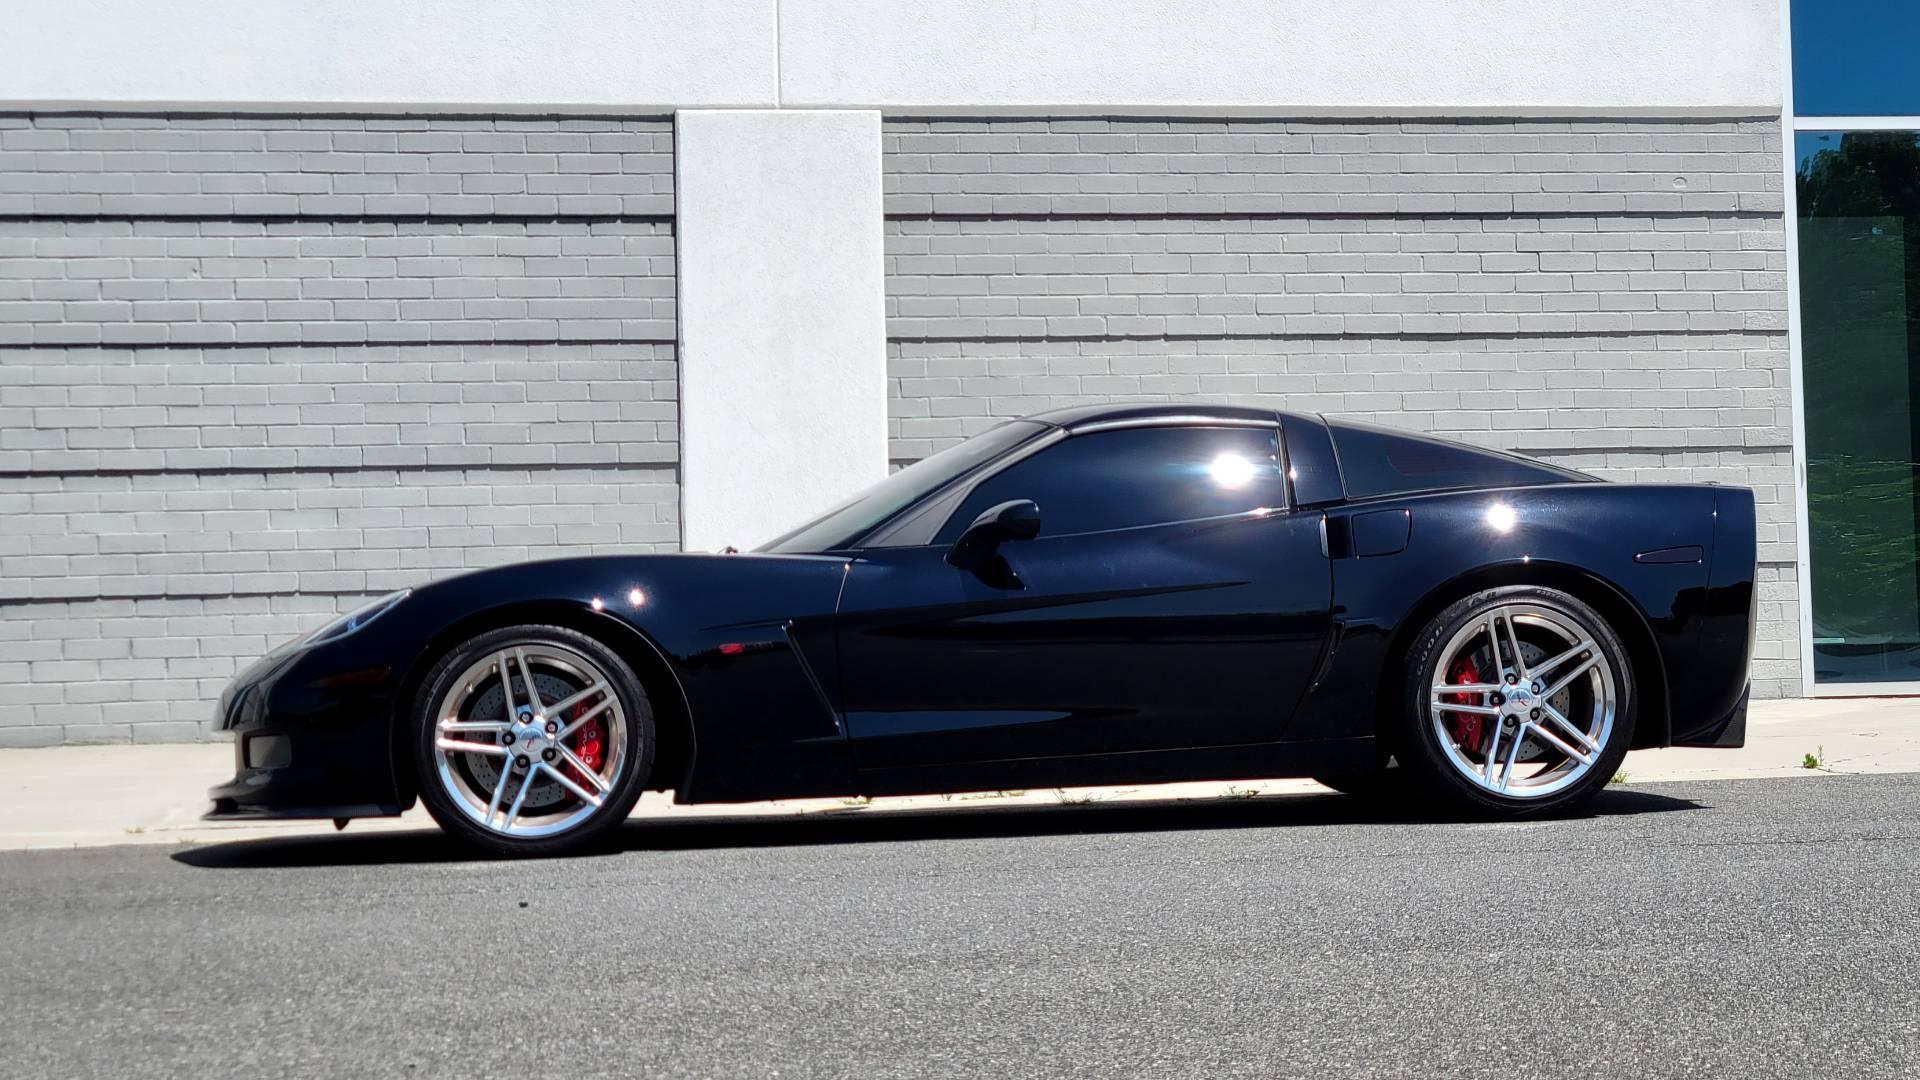 Used 2007 Chevrolet CORVETTE Z06 2LZ / 7.0L 427 V8 / 6-SPD MAN / BOSE / POLISHED WHEELS for sale Sold at Formula Imports in Charlotte NC 28227 17